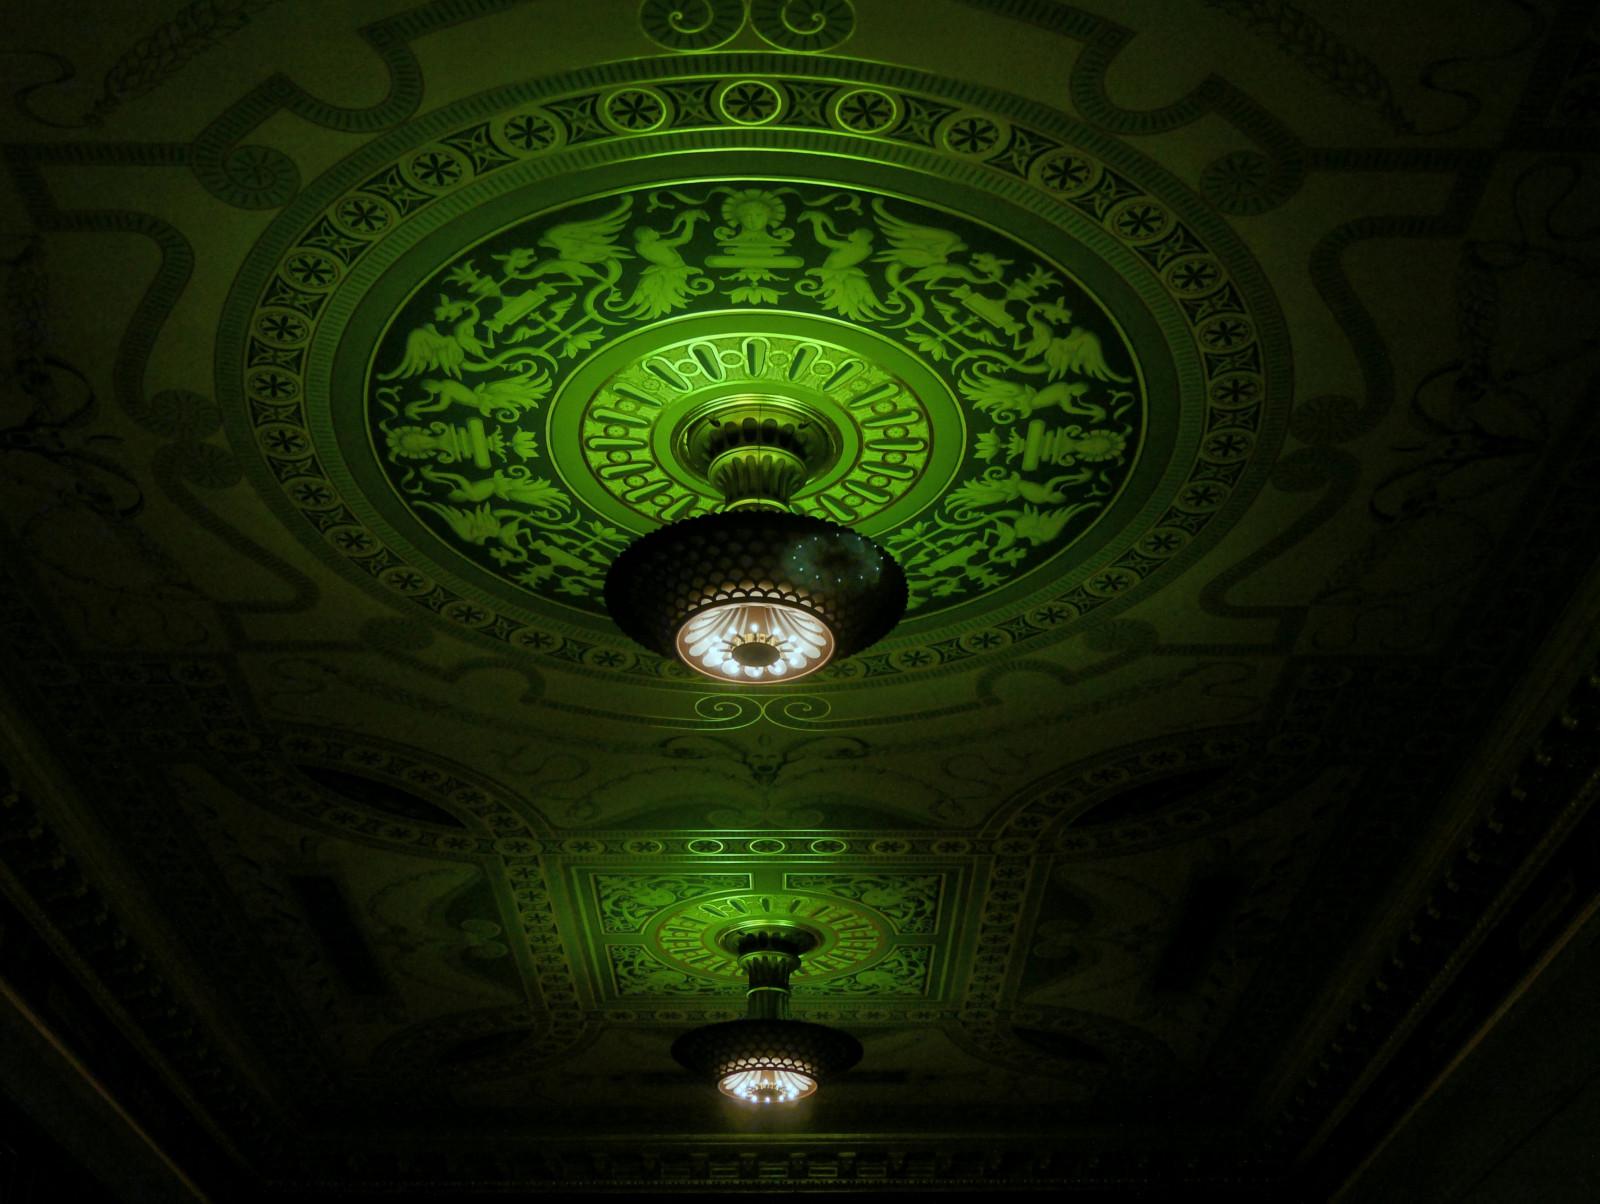 Sfondi : londra sfera simmetria verde inghilterra lampada hdr